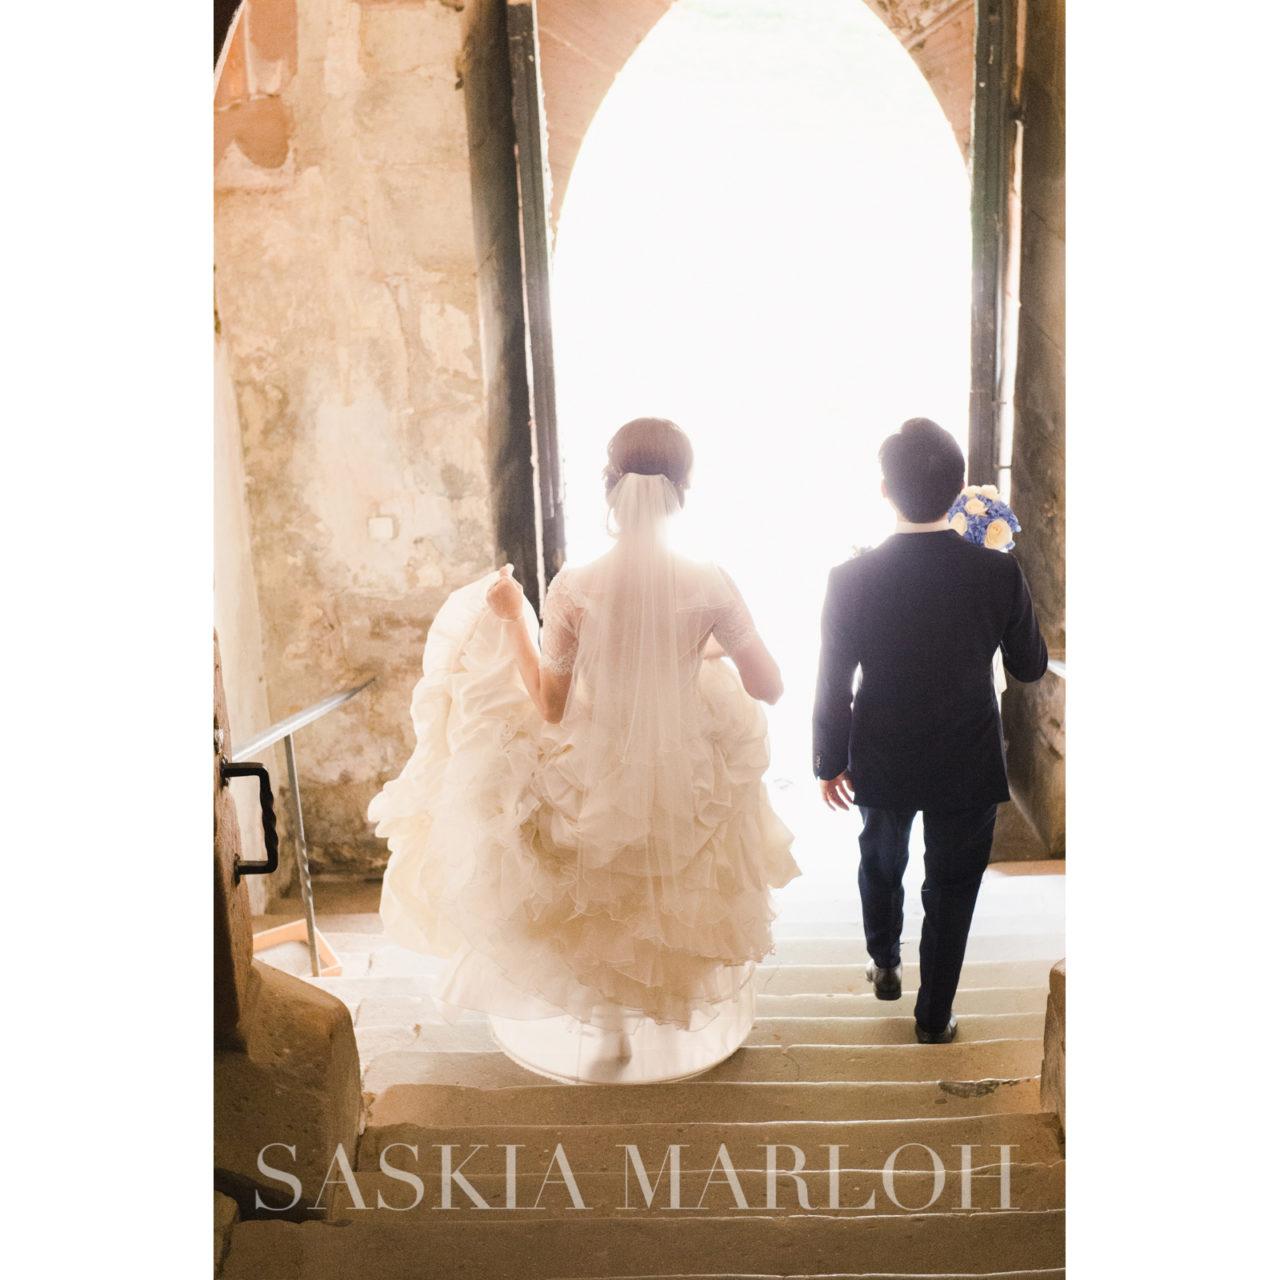 JAPANESE-GERMAN-WEDDING-HOCHZEIT-RHEINGAU-PHOTO-SASKIA-MARLOH-01